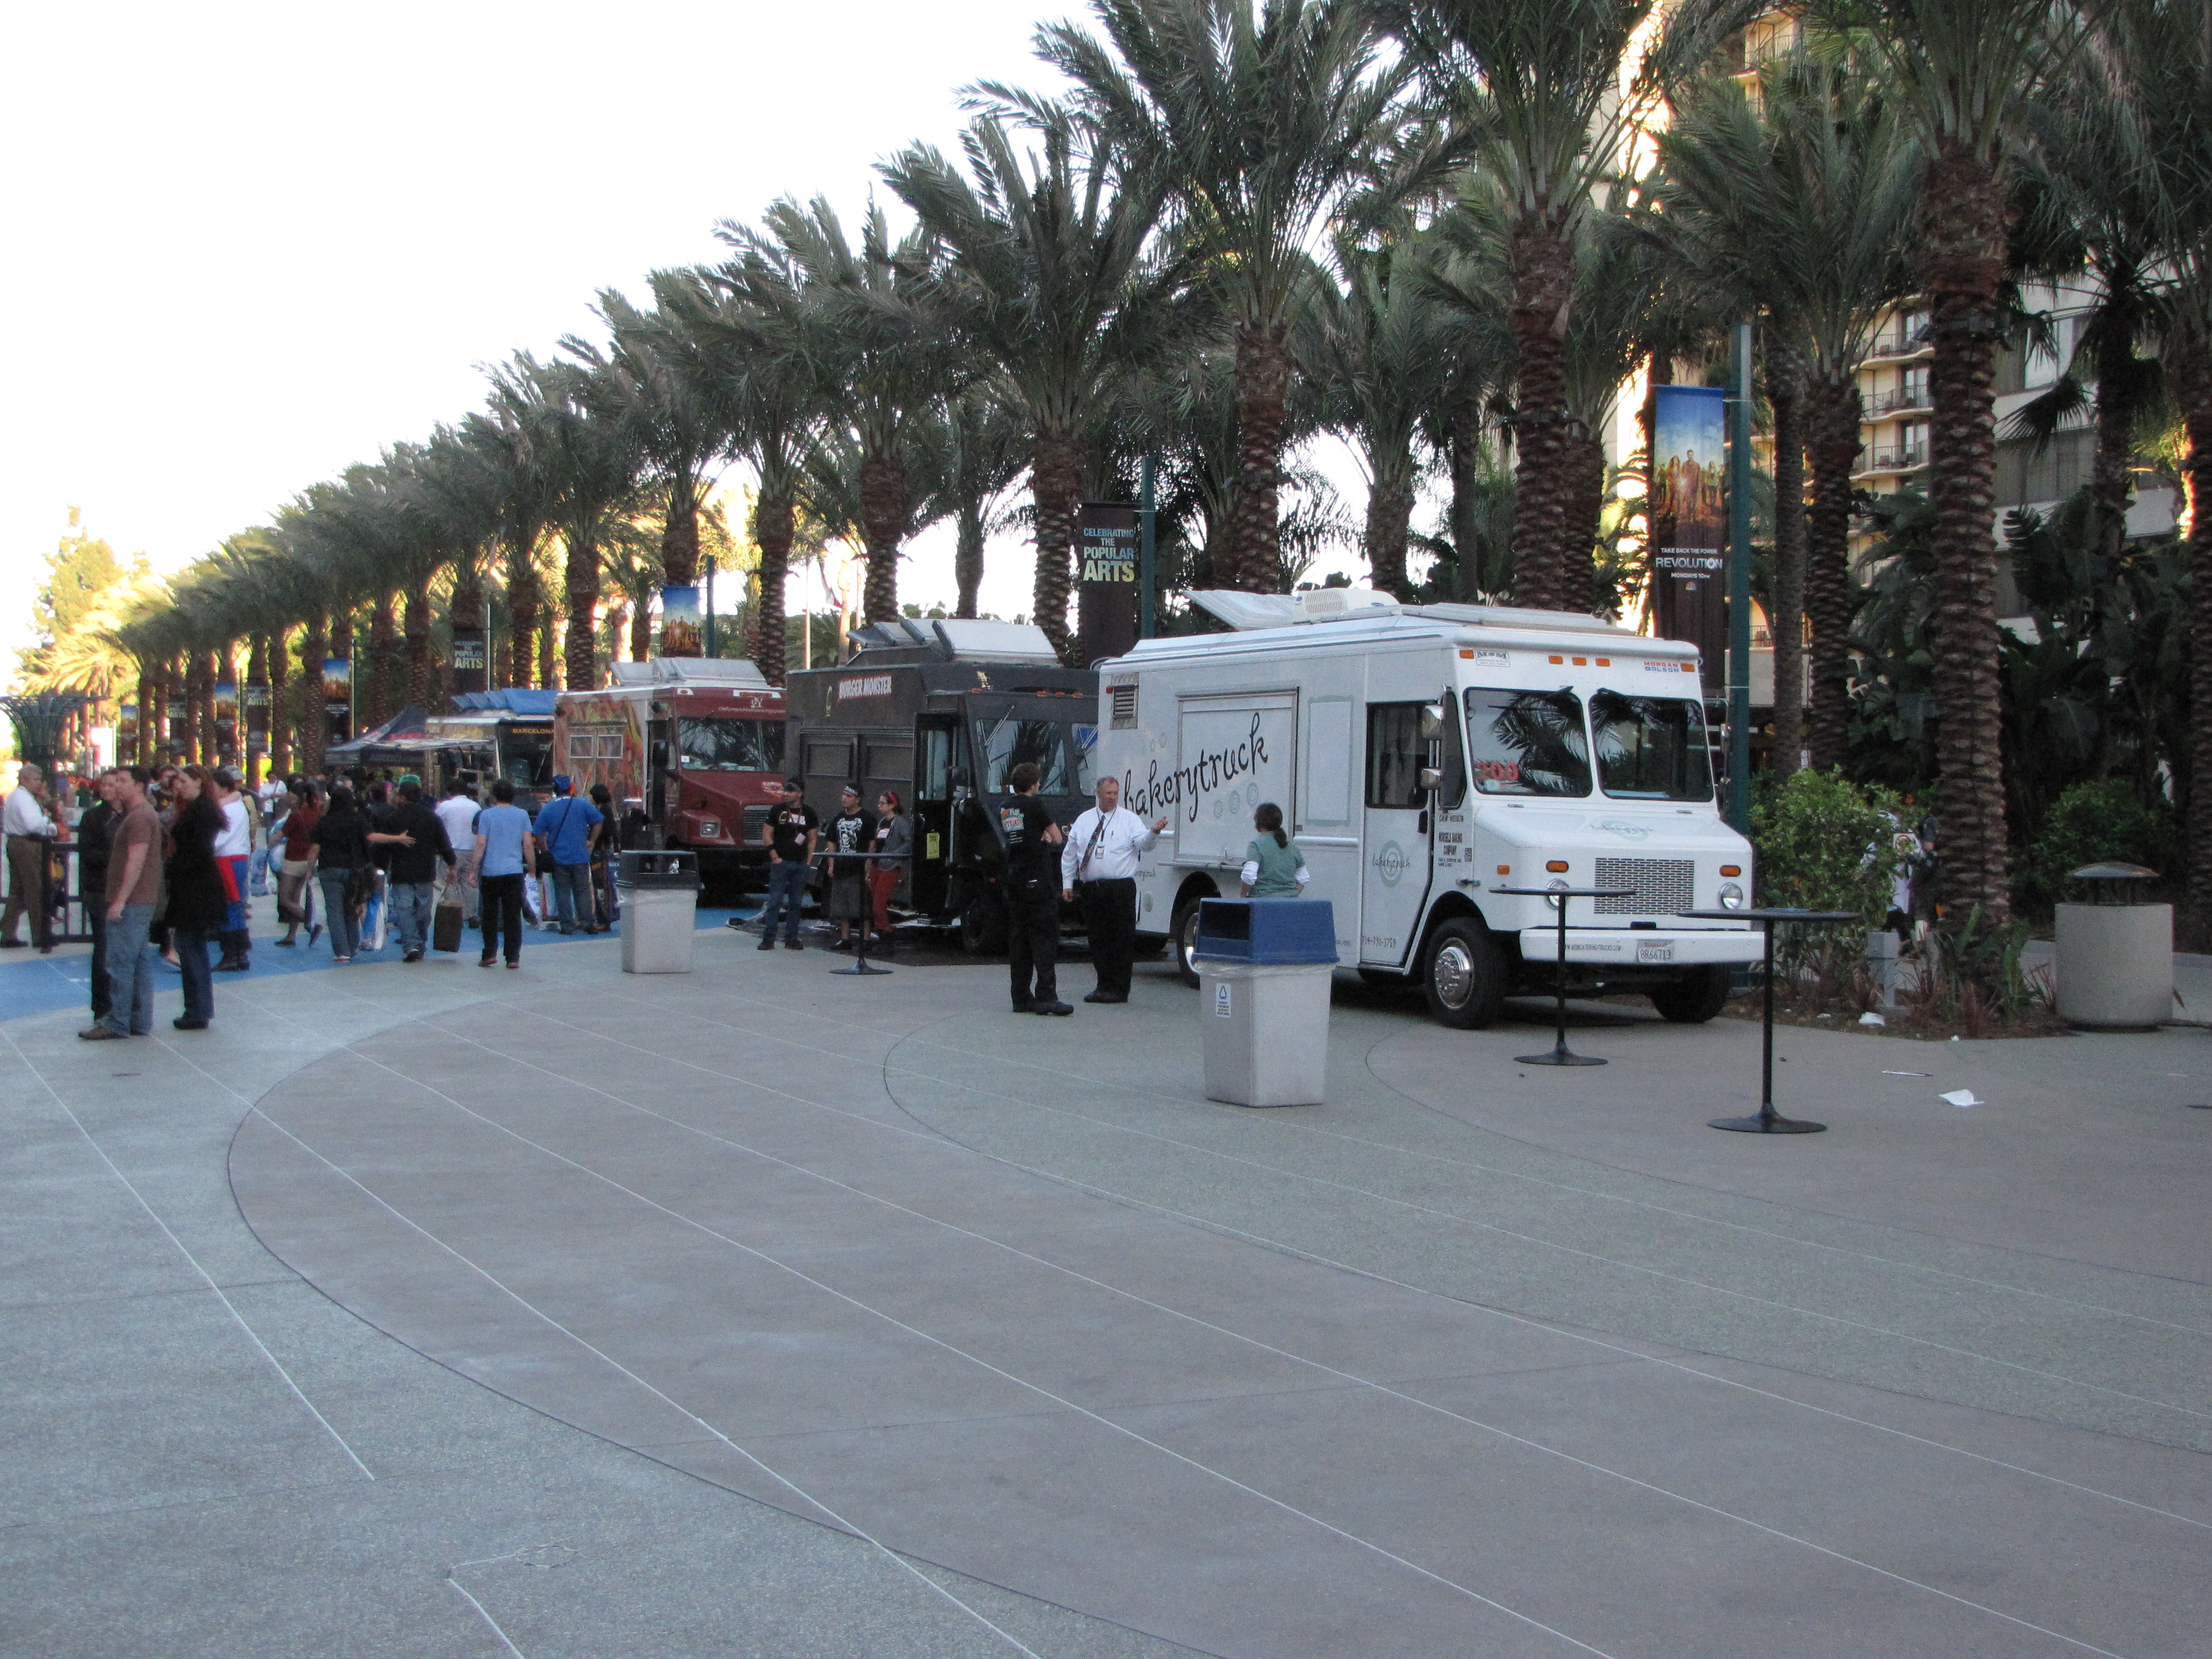 Food trucks...